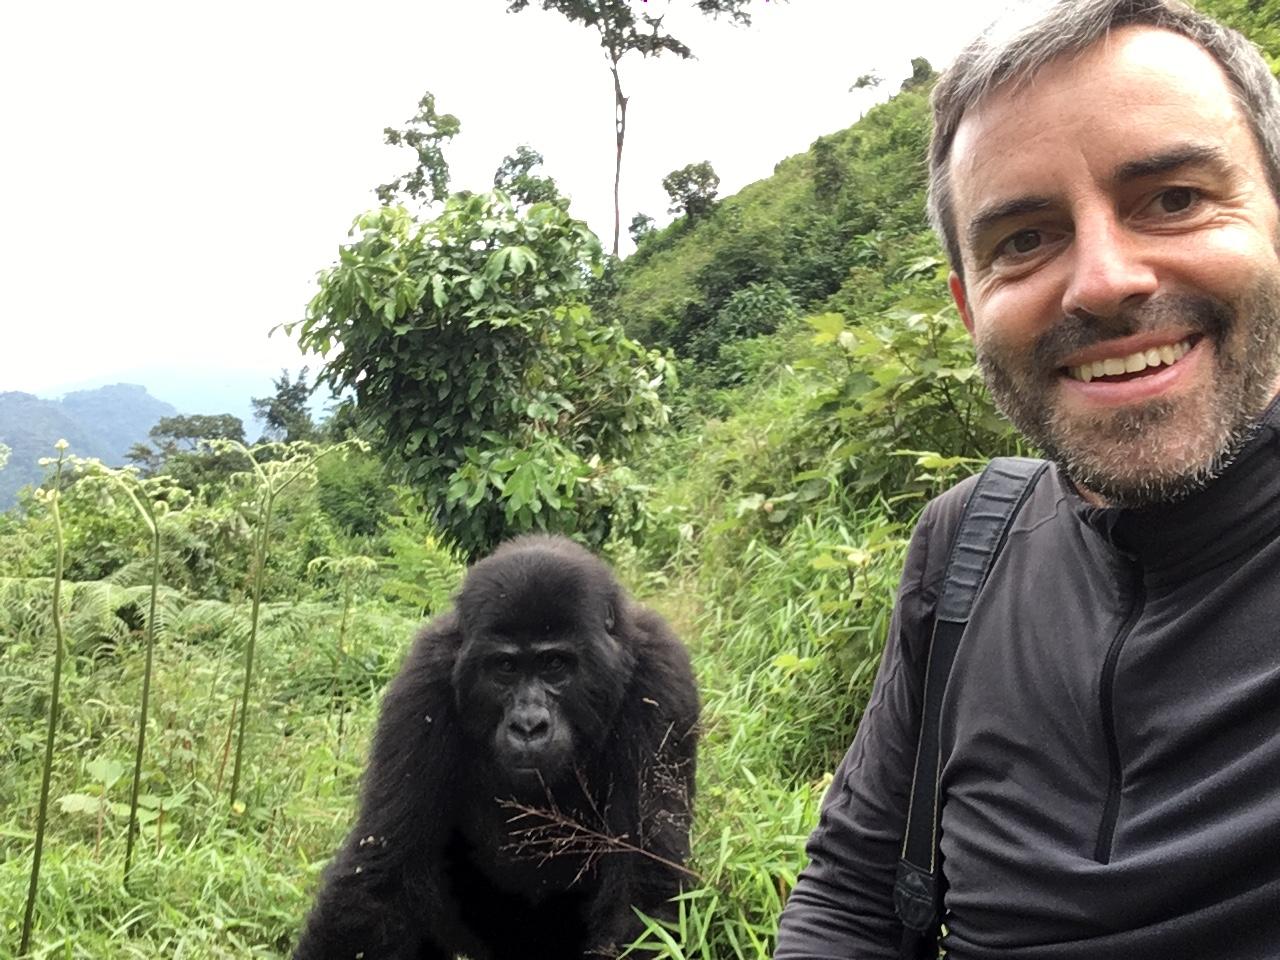 Gorilla Trekking in Uganda   unser Besuch bei den sanften Riesen uganda sonne safari reisebericht new afrika  tui berlin uganda selfie mit gorilla